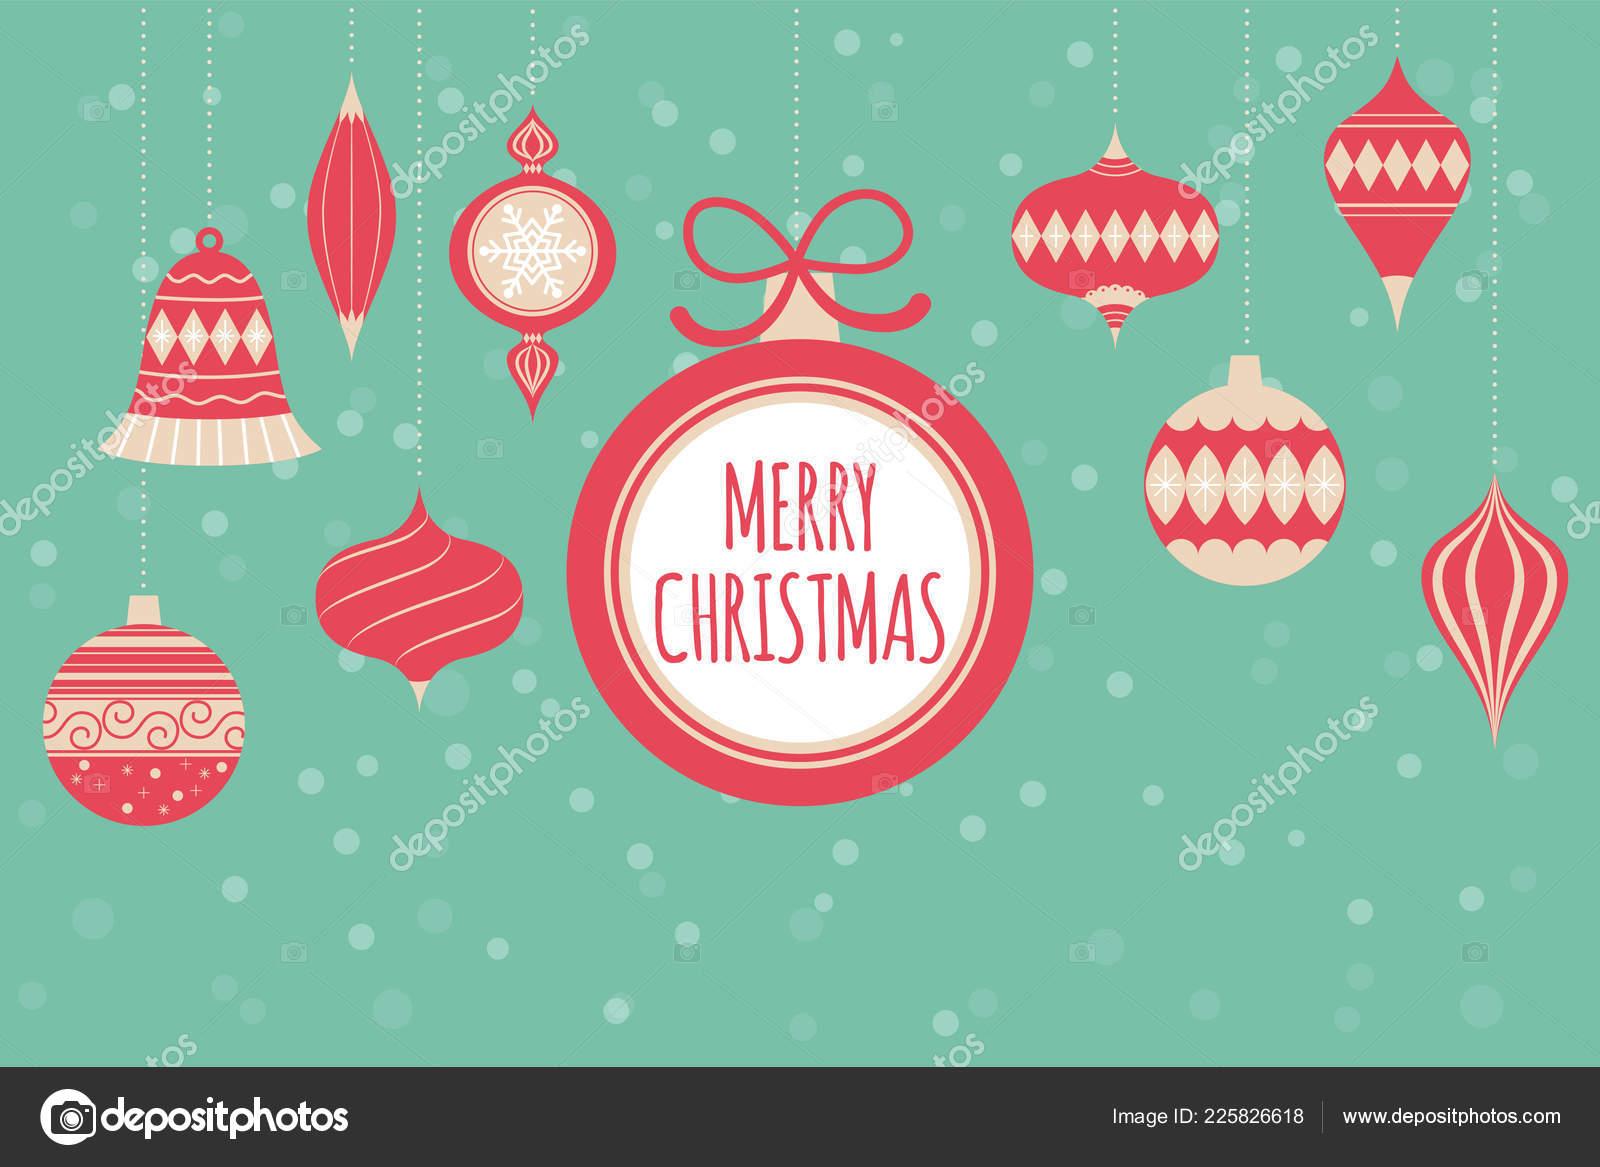 Merry Christmas Greeting Card Christmas Balls Happy Holiday